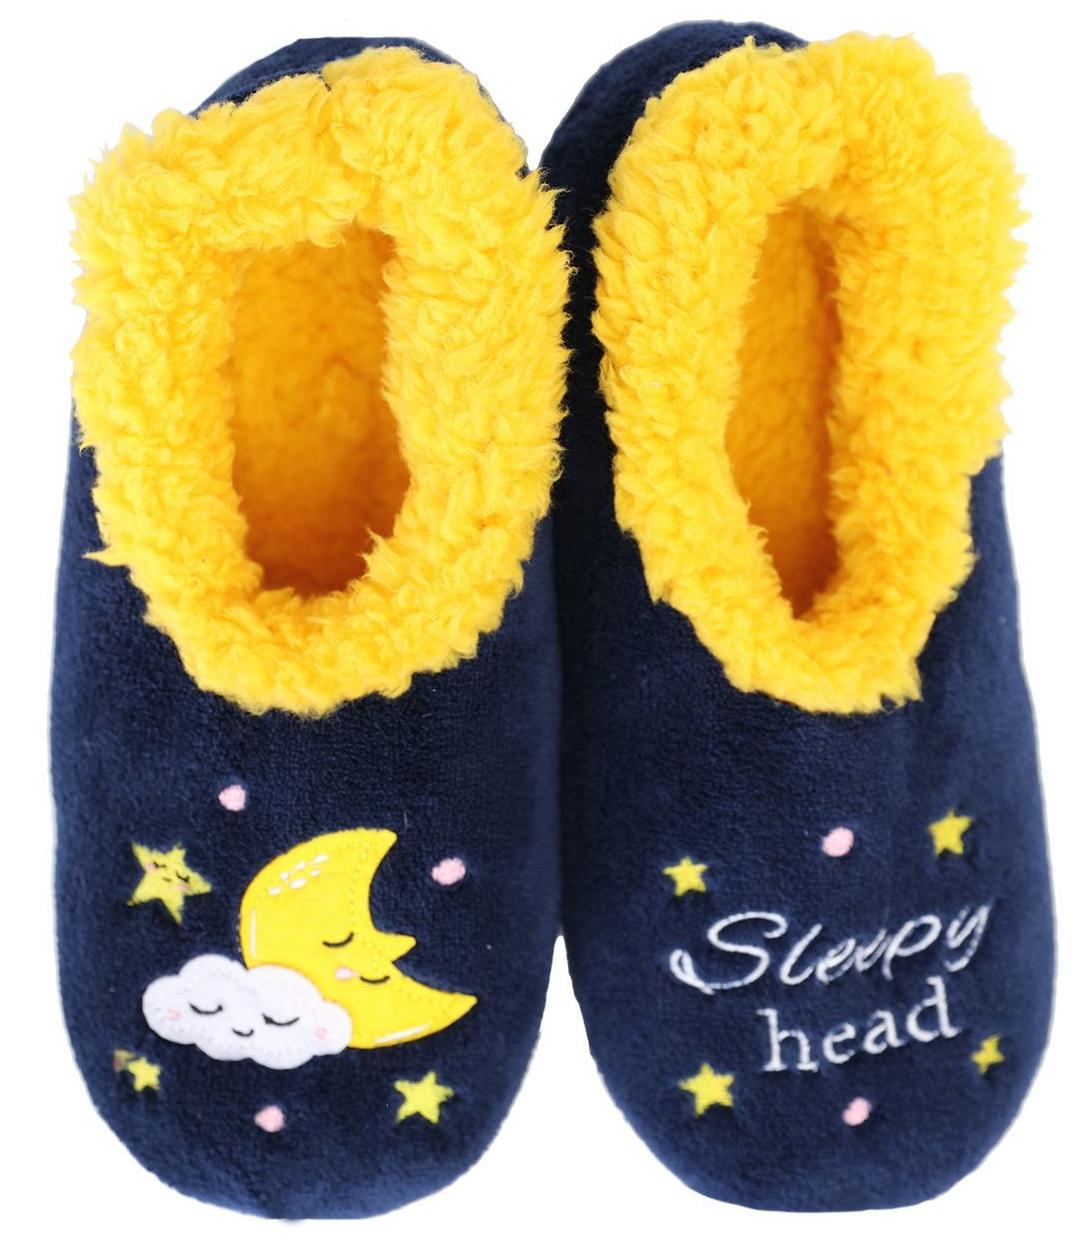 Slumbies: Sleepy Head Pairables - Womens Slippers (Small) image